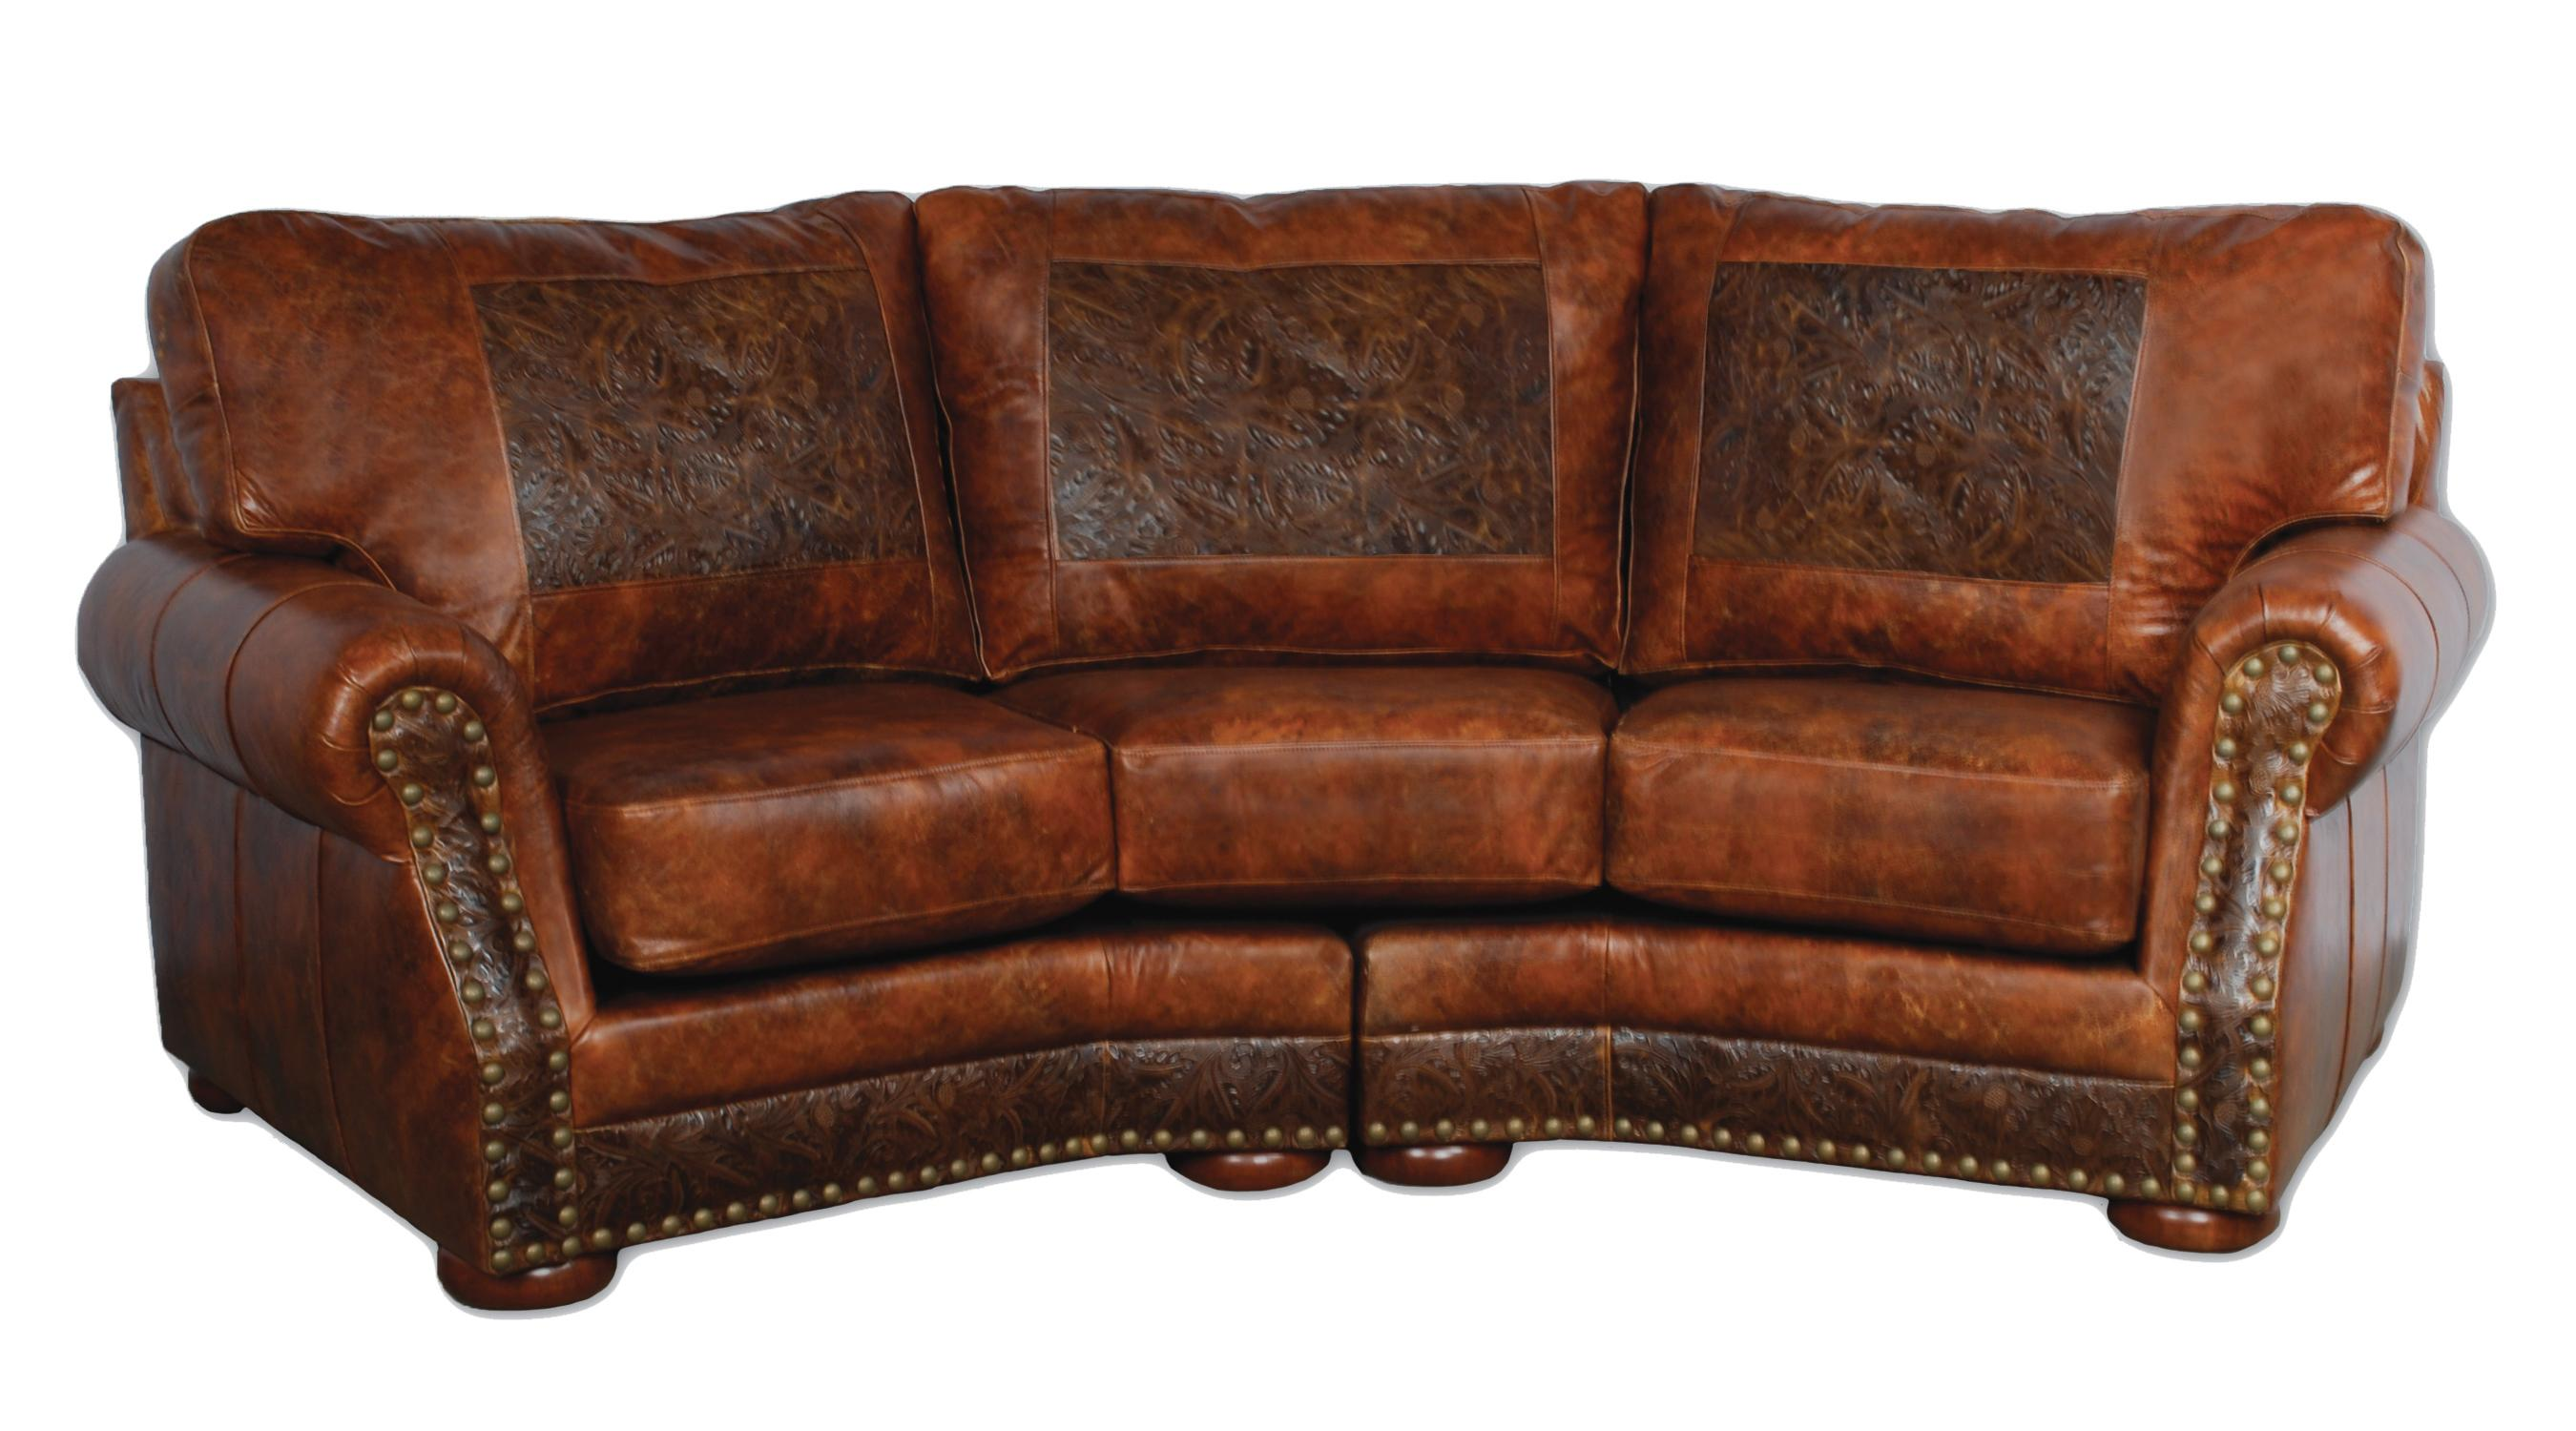 leather furniture cameron ranch conversaton sofa antiquity ember u0026 cosmopolitian tooled  leather LFJAVPN